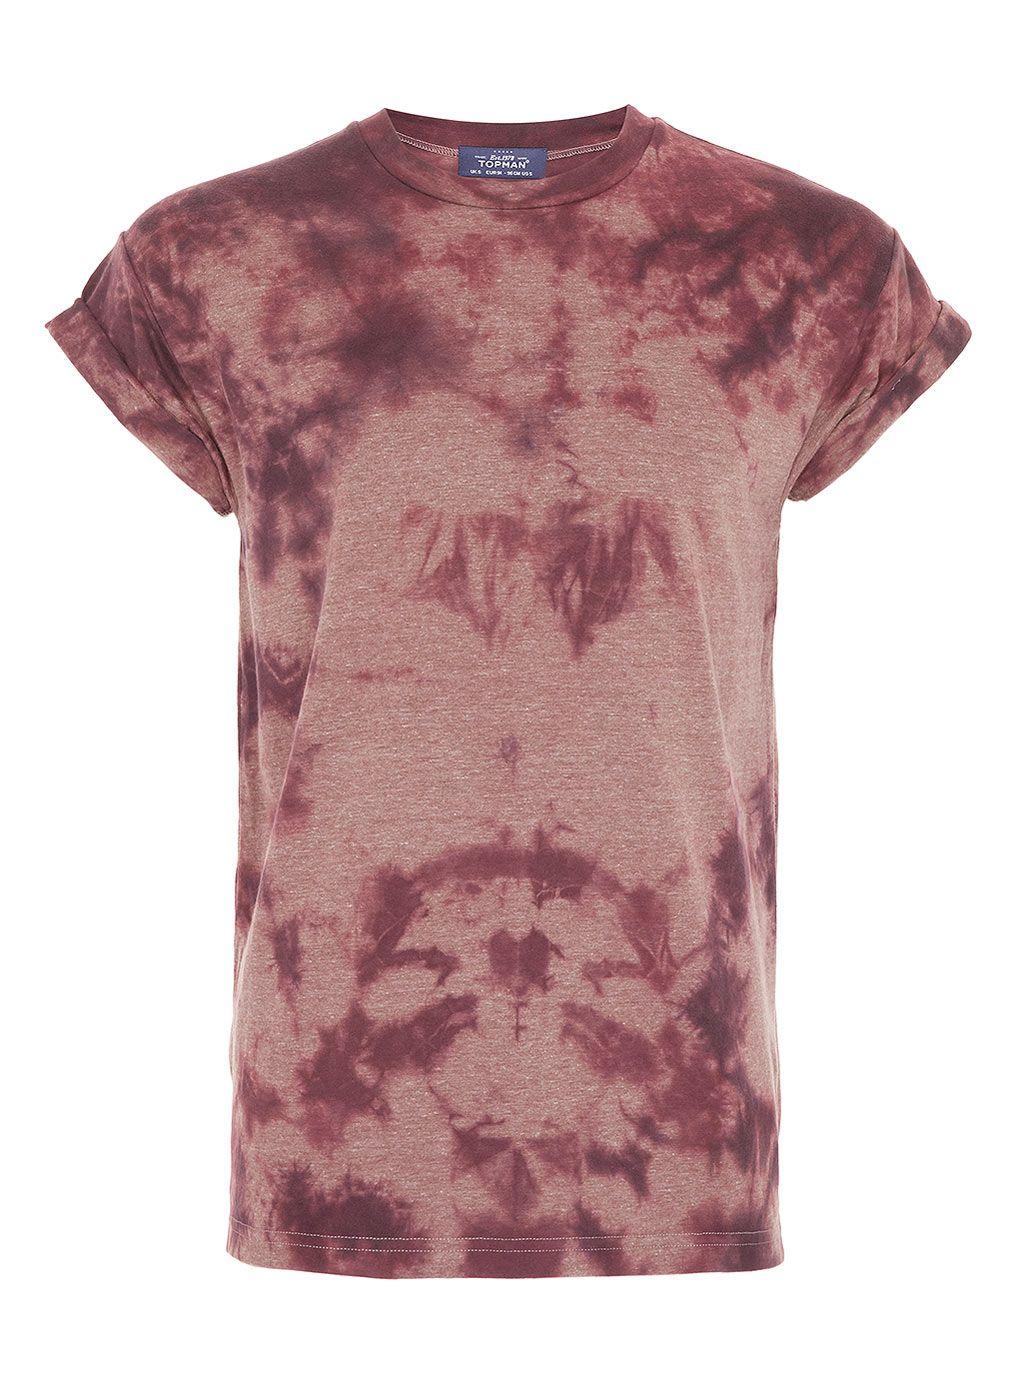 Burgundy tie dye tshirt topman price 2000 with